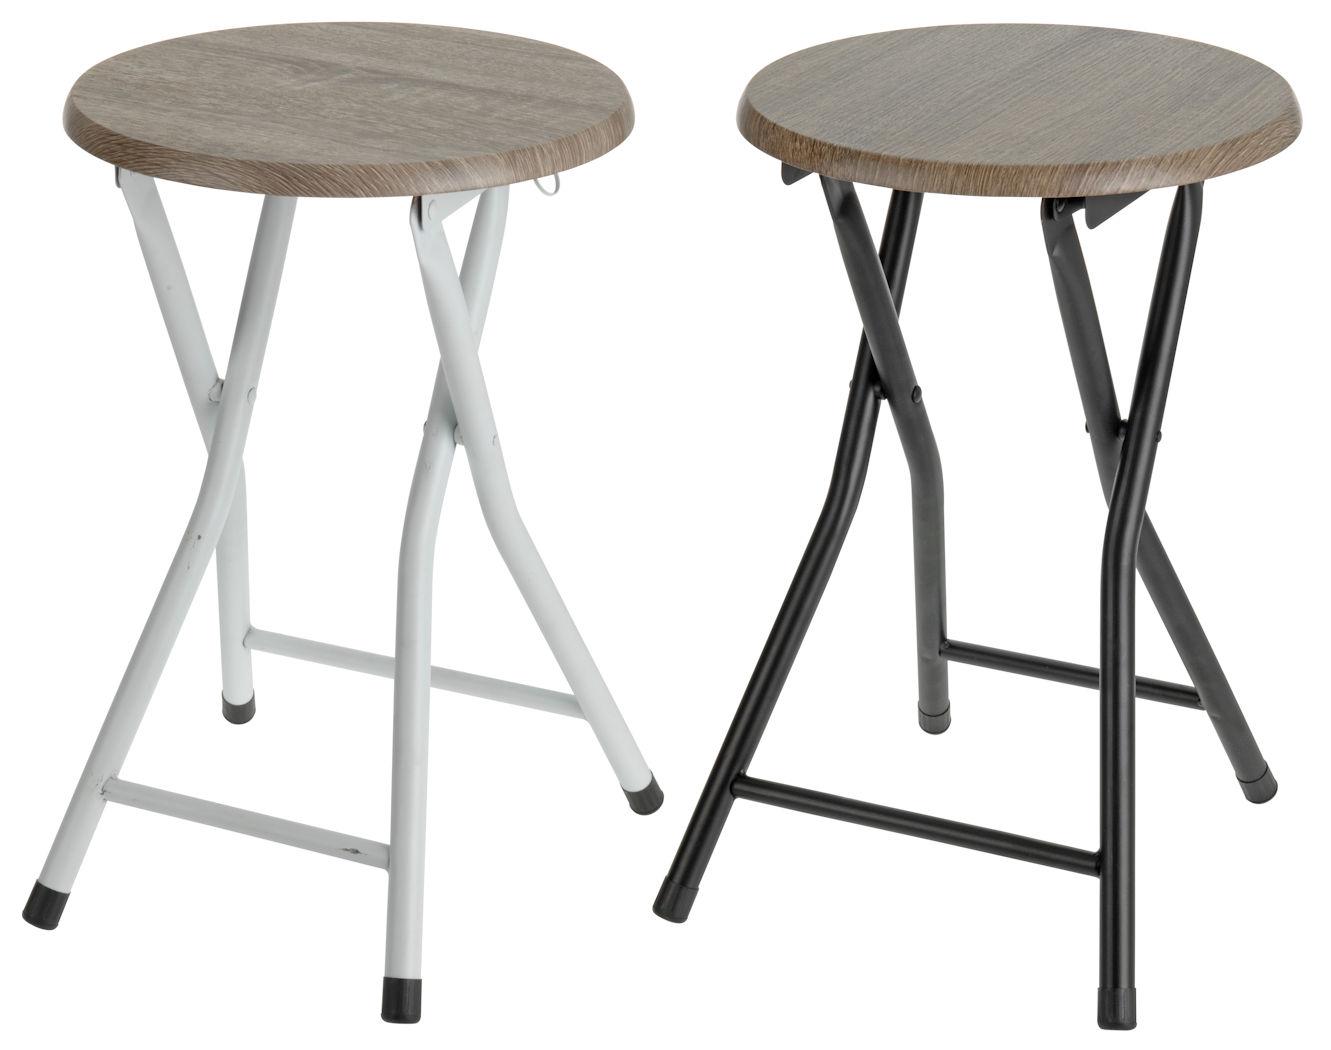 klapphocker holz holzhocker klappstuhl sitzhocker hocker stuhl klappbar rund ebay. Black Bedroom Furniture Sets. Home Design Ideas